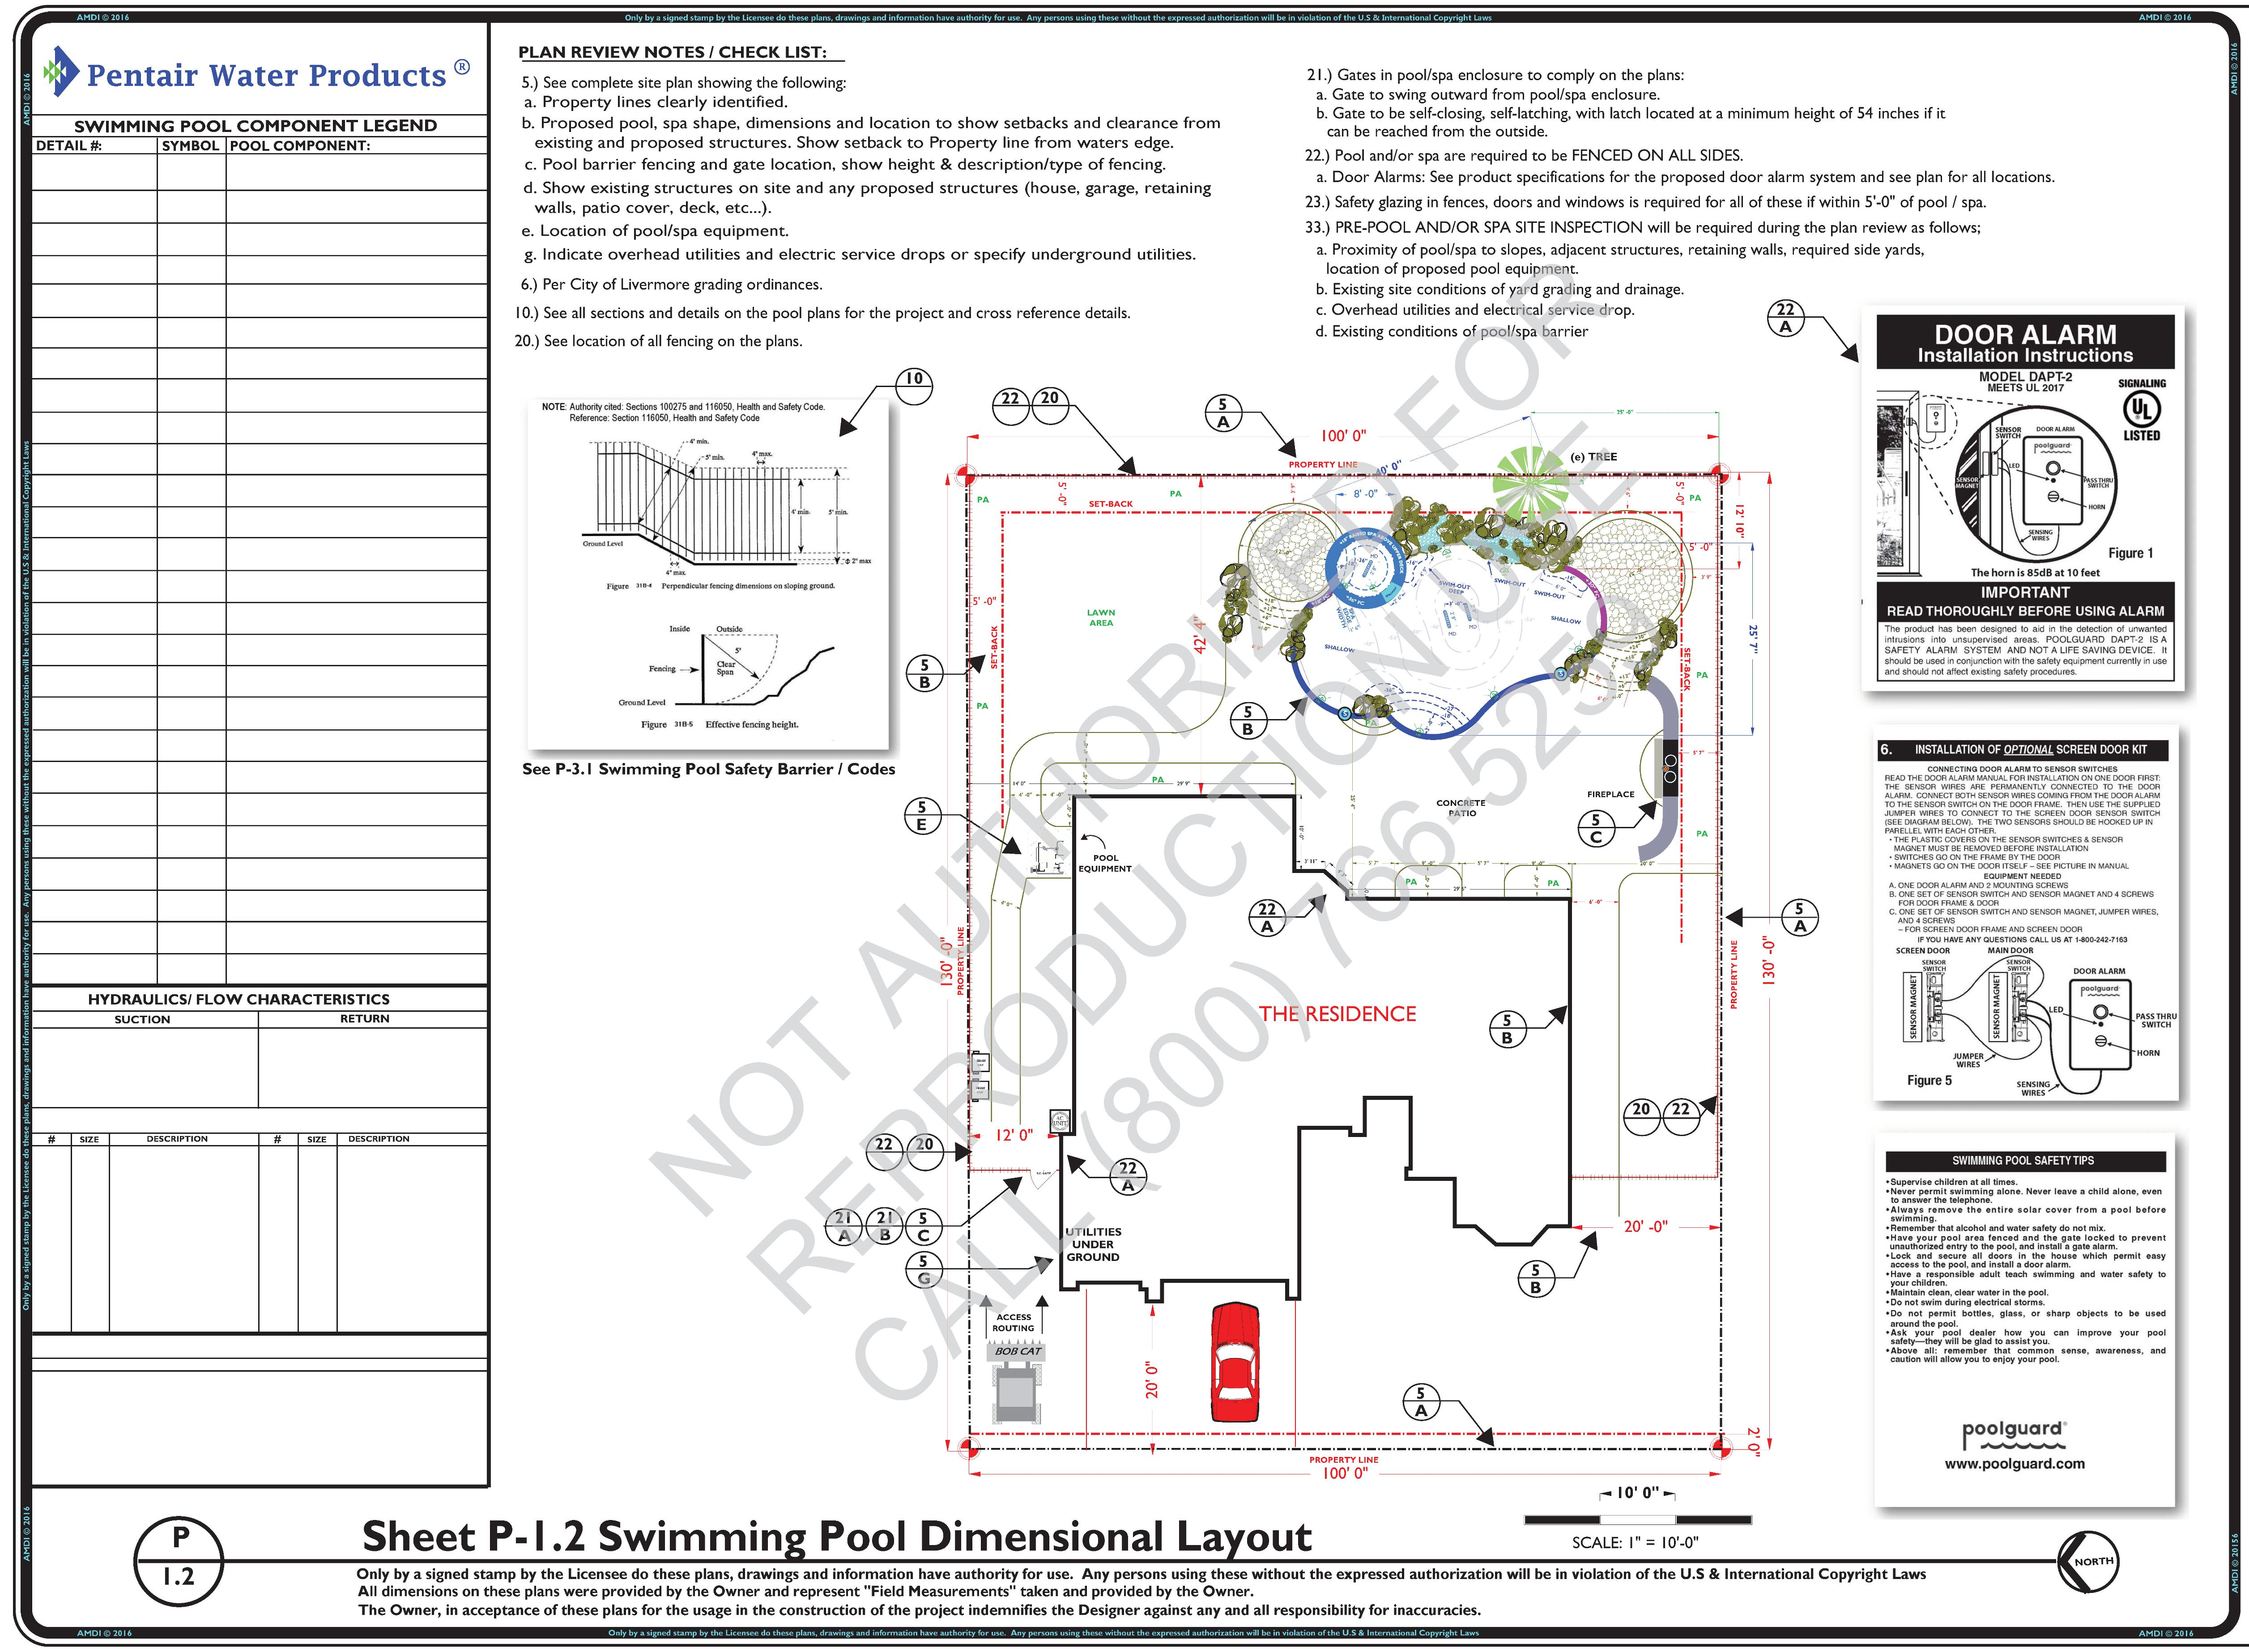 P-1.2 Swimming Pool Dimensional Layout